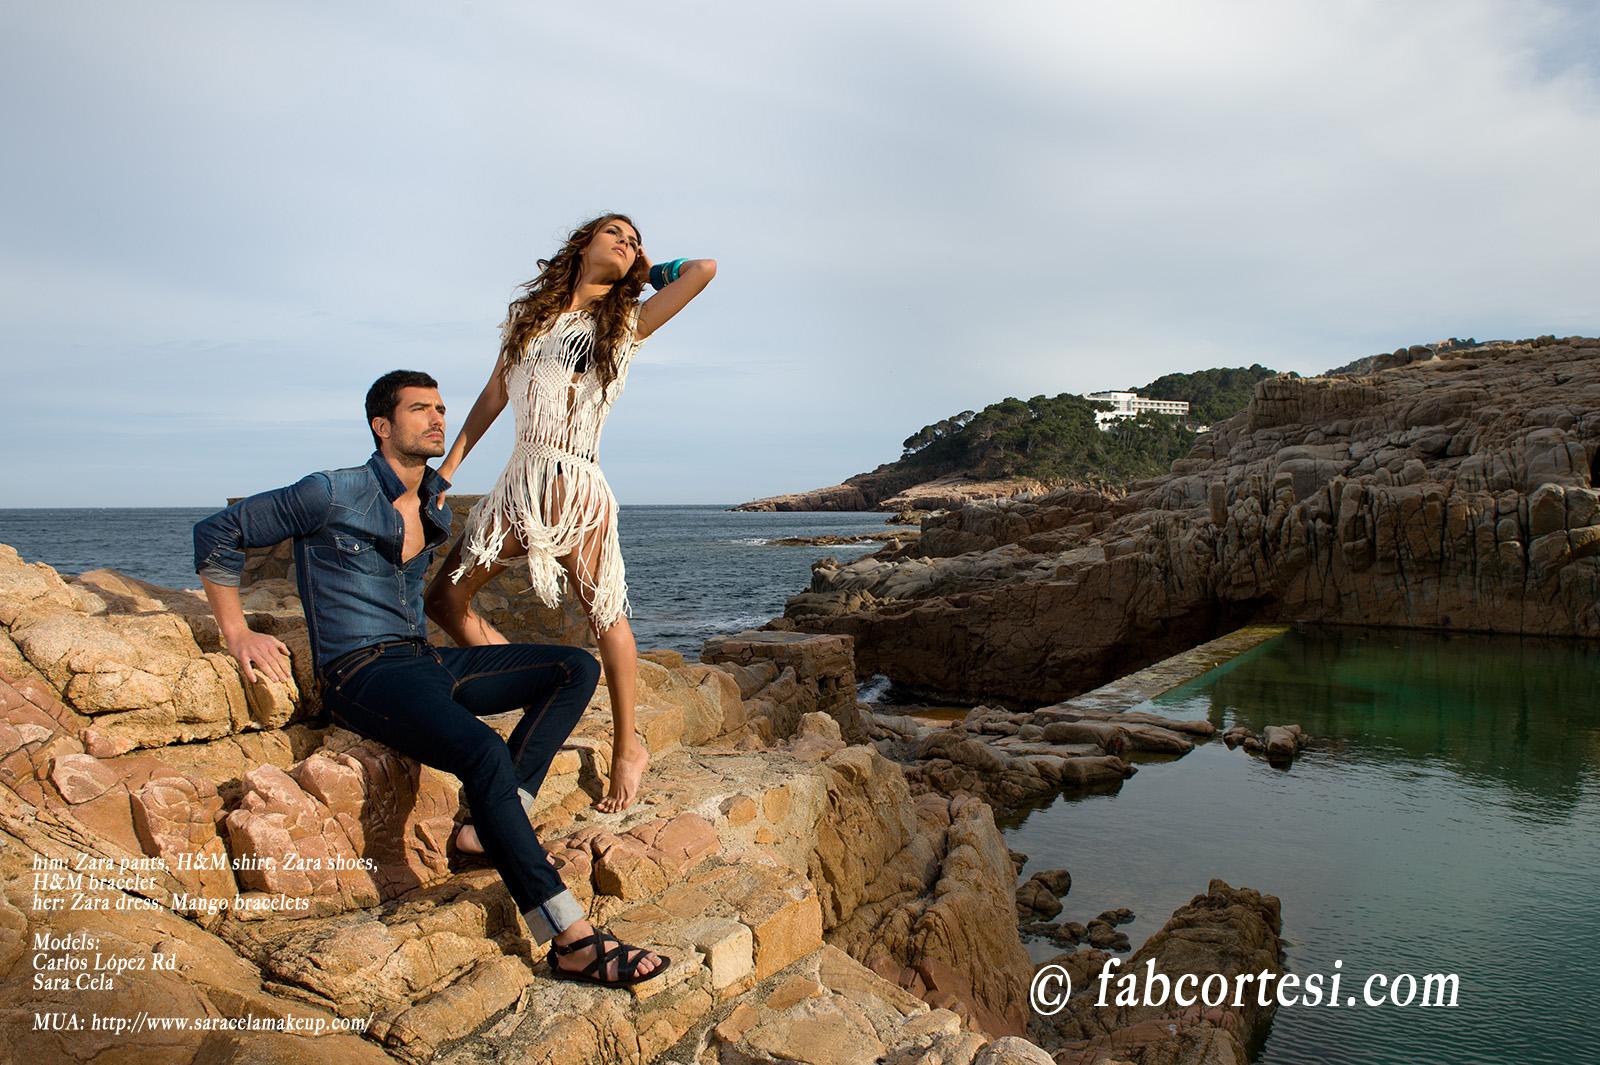 him: Zara pants, H&M shirt, Zara shoes, H&M bracelether: Zara dress, Mango braceletsModels: Carlos López RdSara CelaMUA: http://www.saracelamakeup.com/